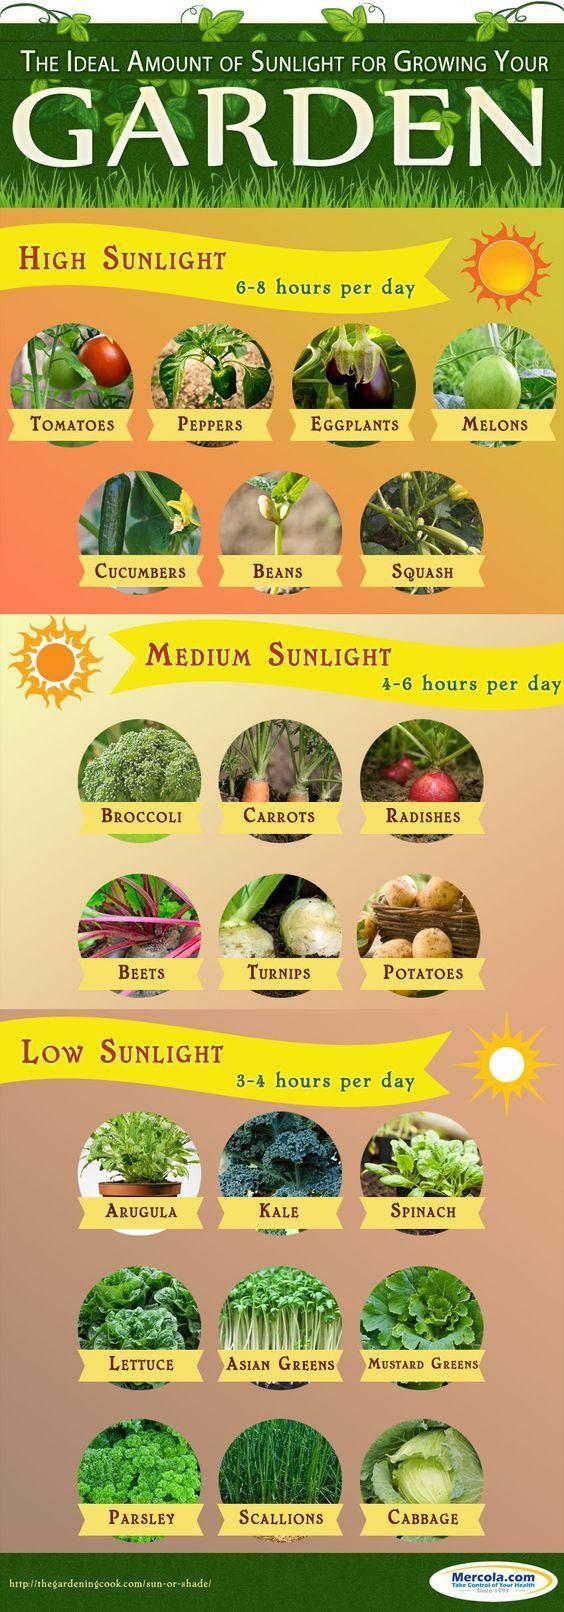 Vegetable Gardening Tips to Make Anyone An Expert Gardener